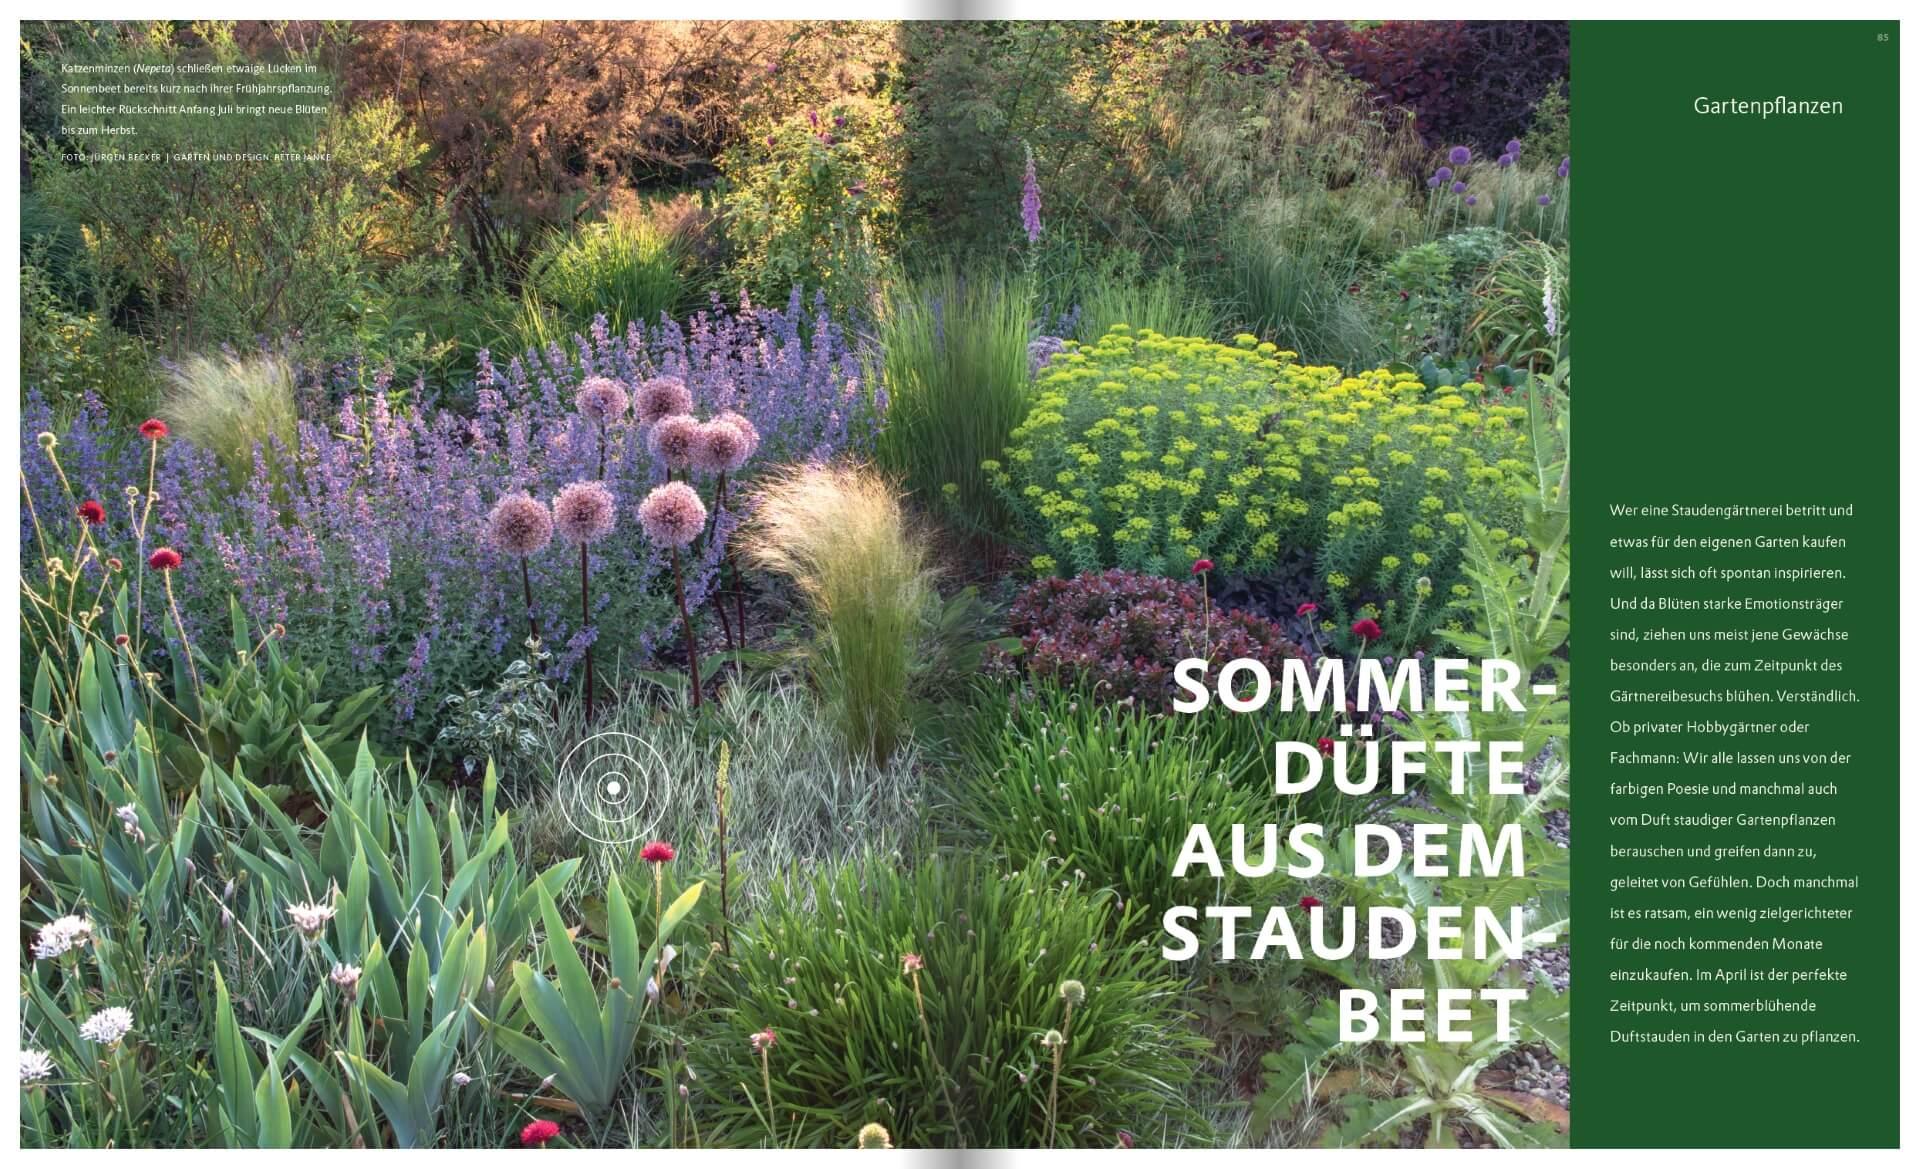 GARTENDESIGN INSPIRATION 2/2018: Sommerdüfte aus dem Staudenbeet